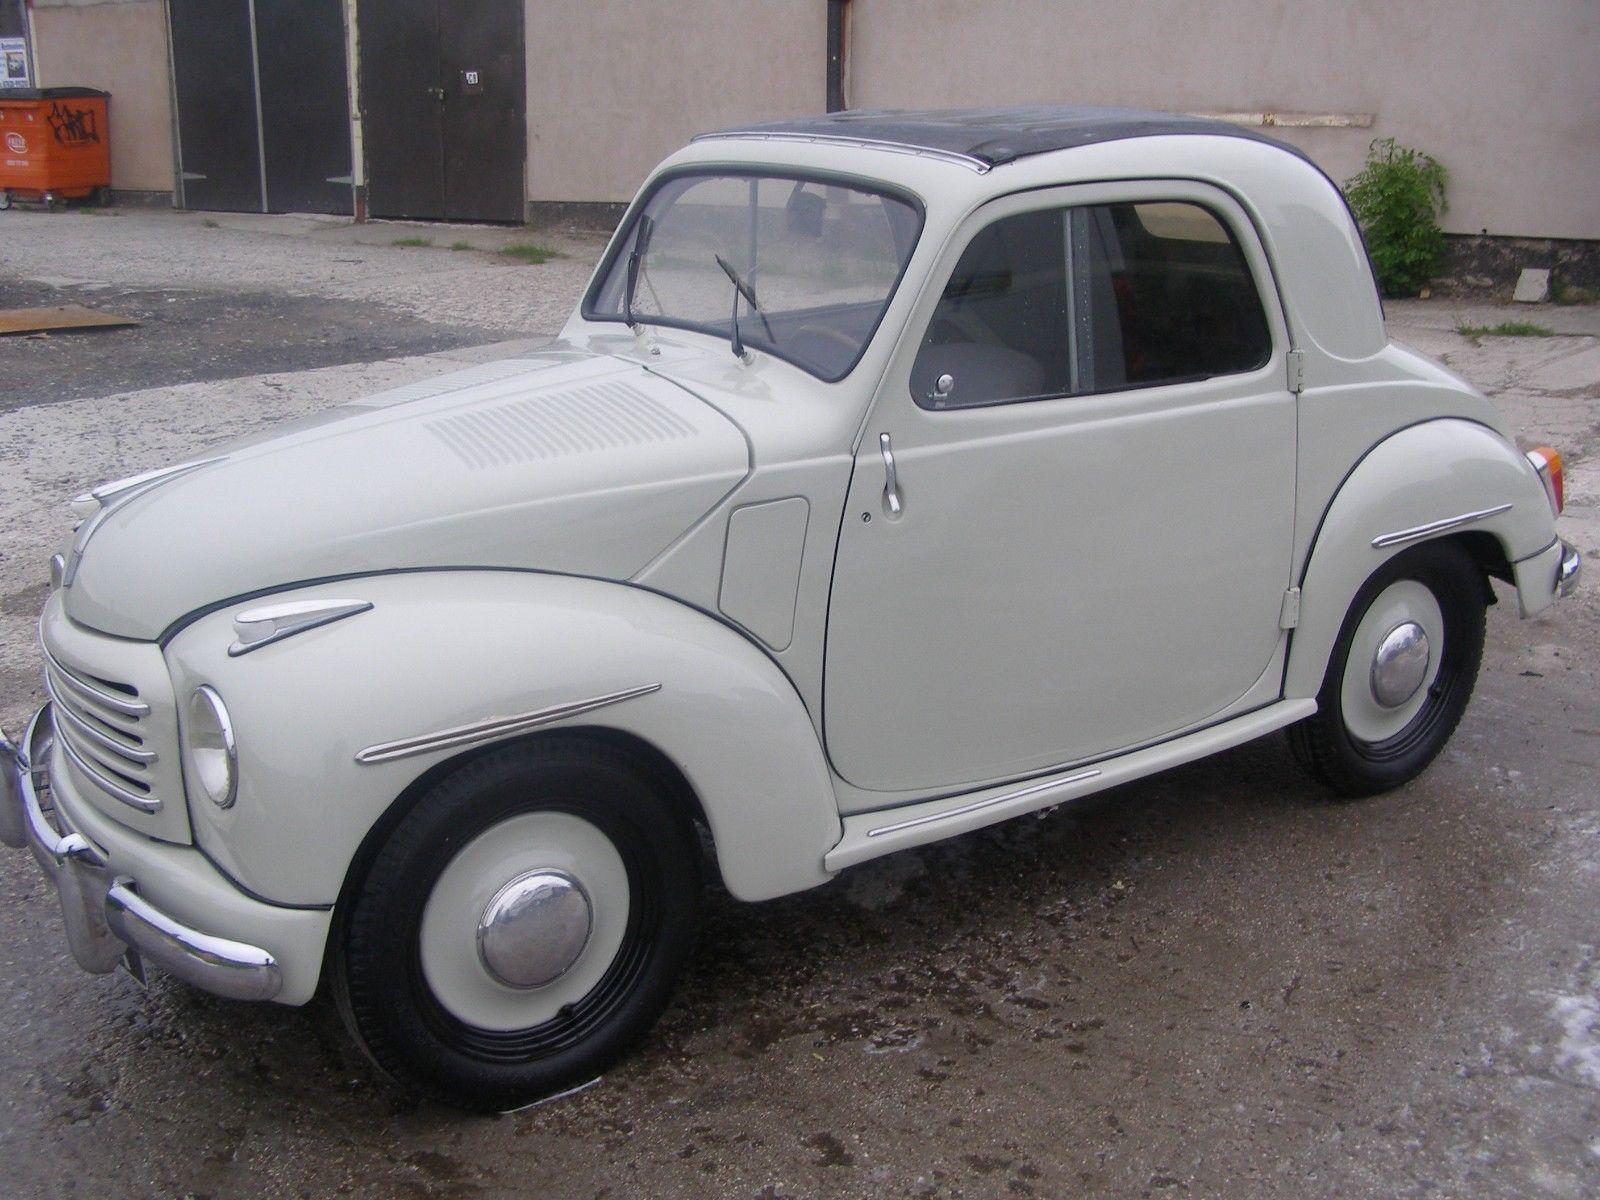 Ebay Fiat Topolino Classiccars Cars Fiat Topolino Classic Motors Fiat